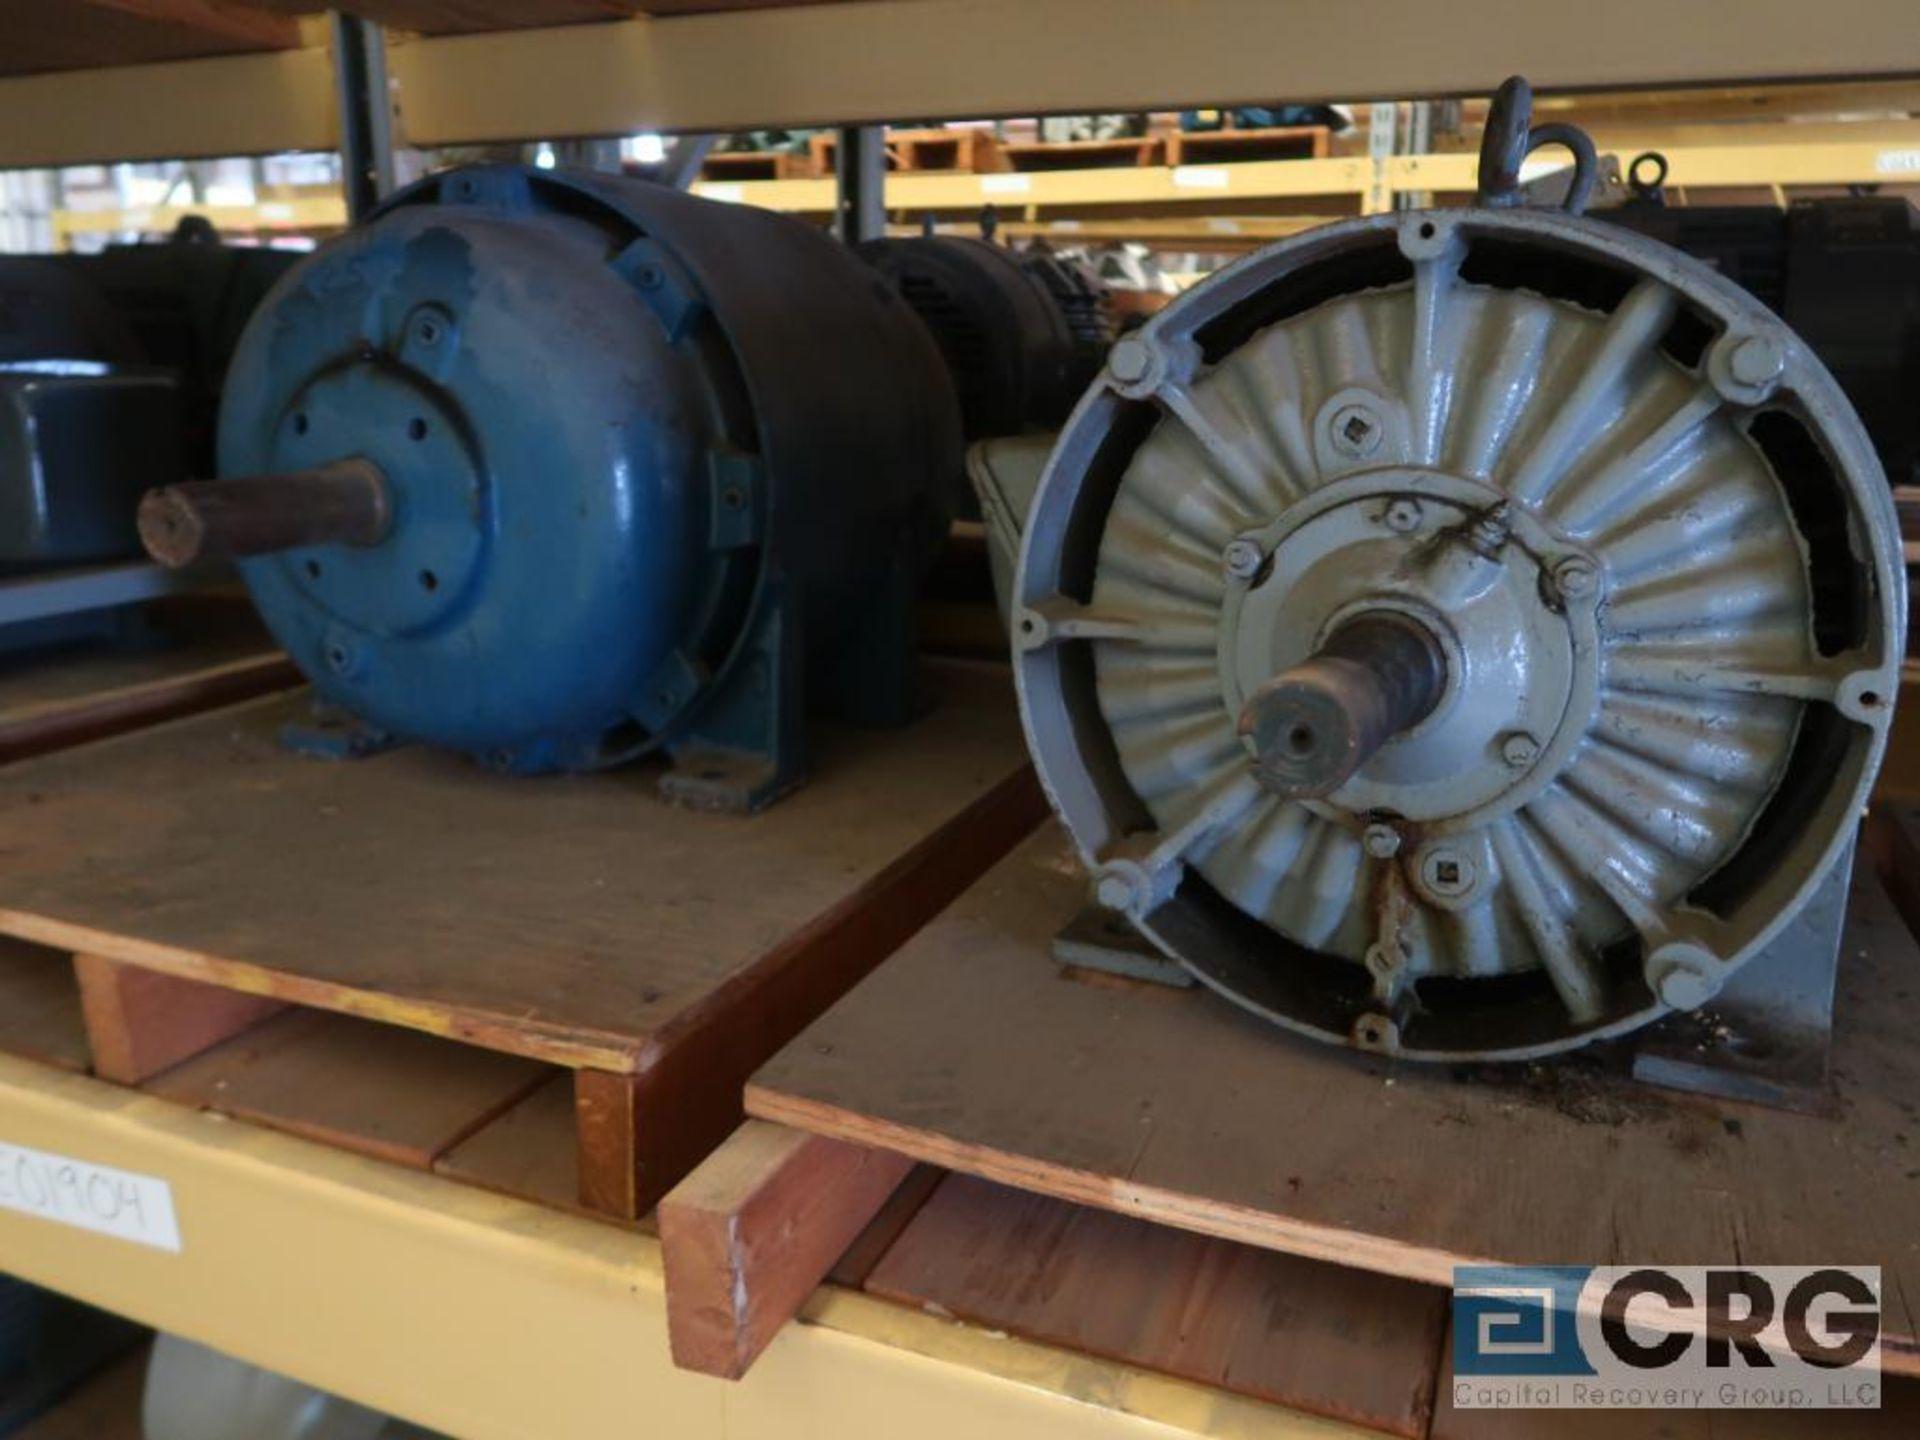 Lot of (5) assorted 25 HP motors on (2) shelves (Motor Building) - Image 2 of 3